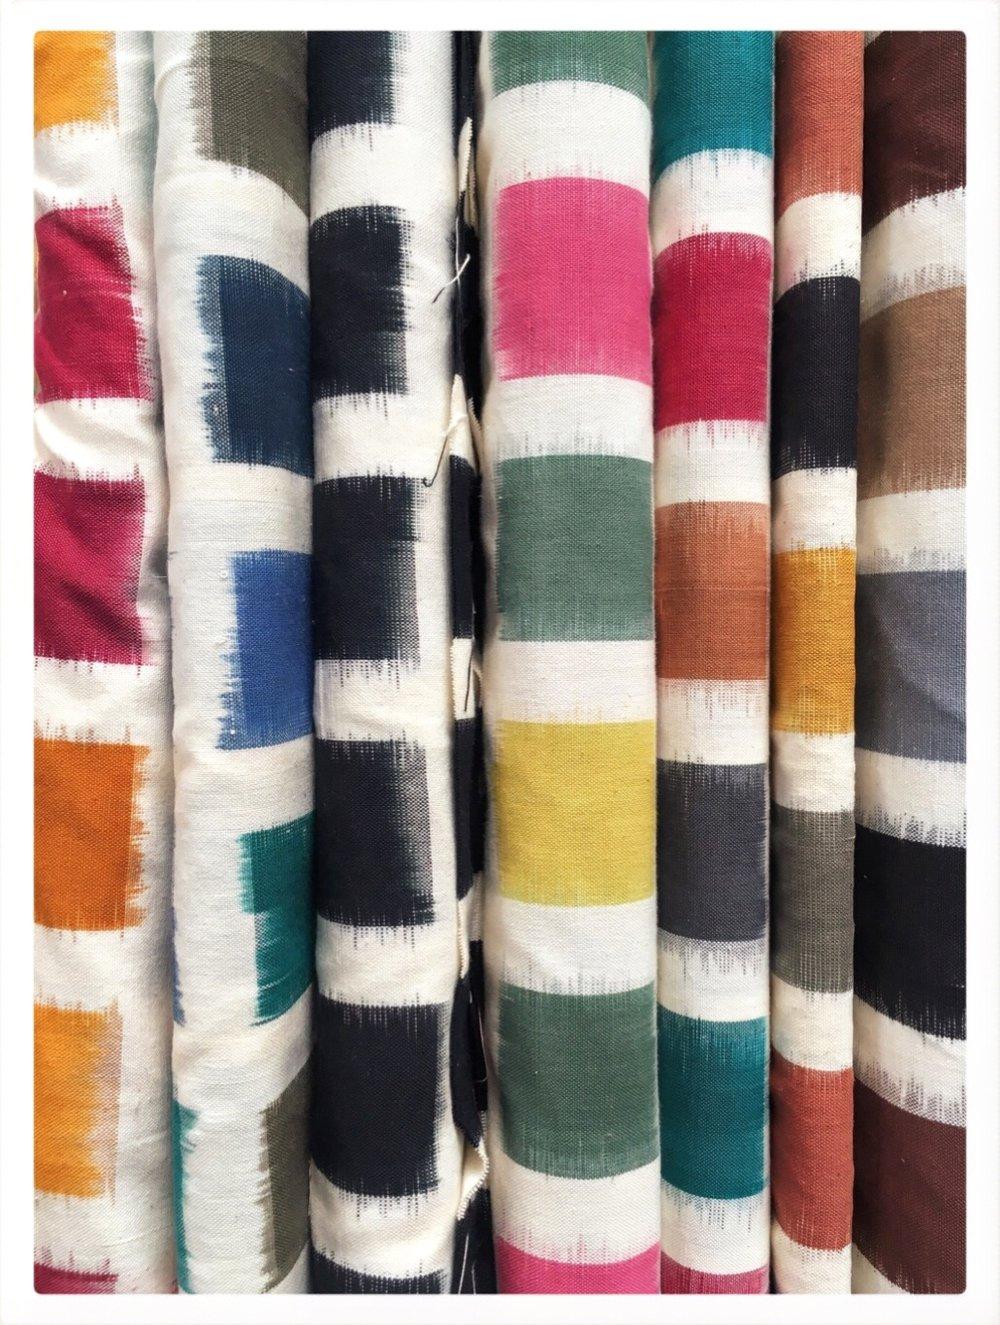 Fabric Rothko